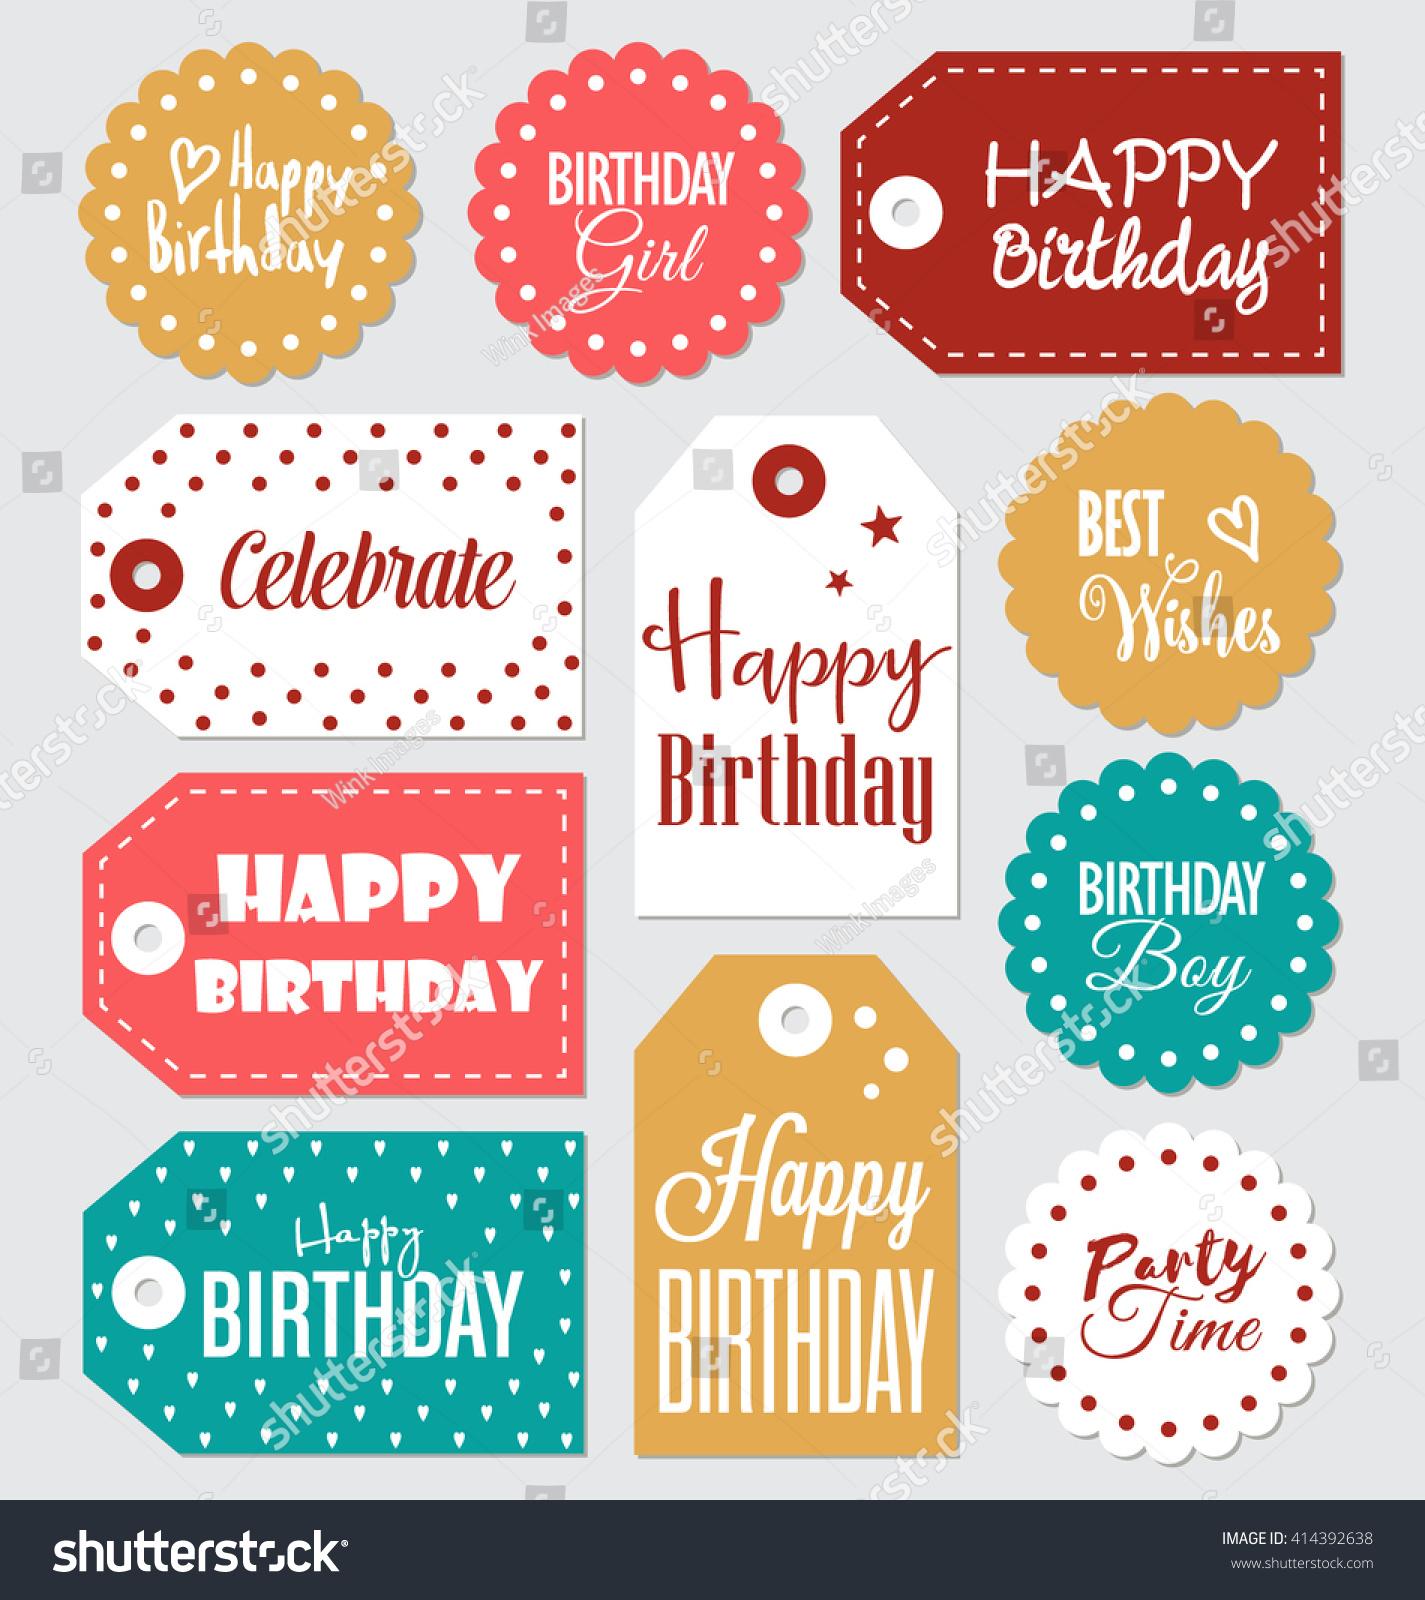 image regarding Happy Birthday Tag Printable named Mounted of Birthday reward tags typographic Inventory Image 414392638